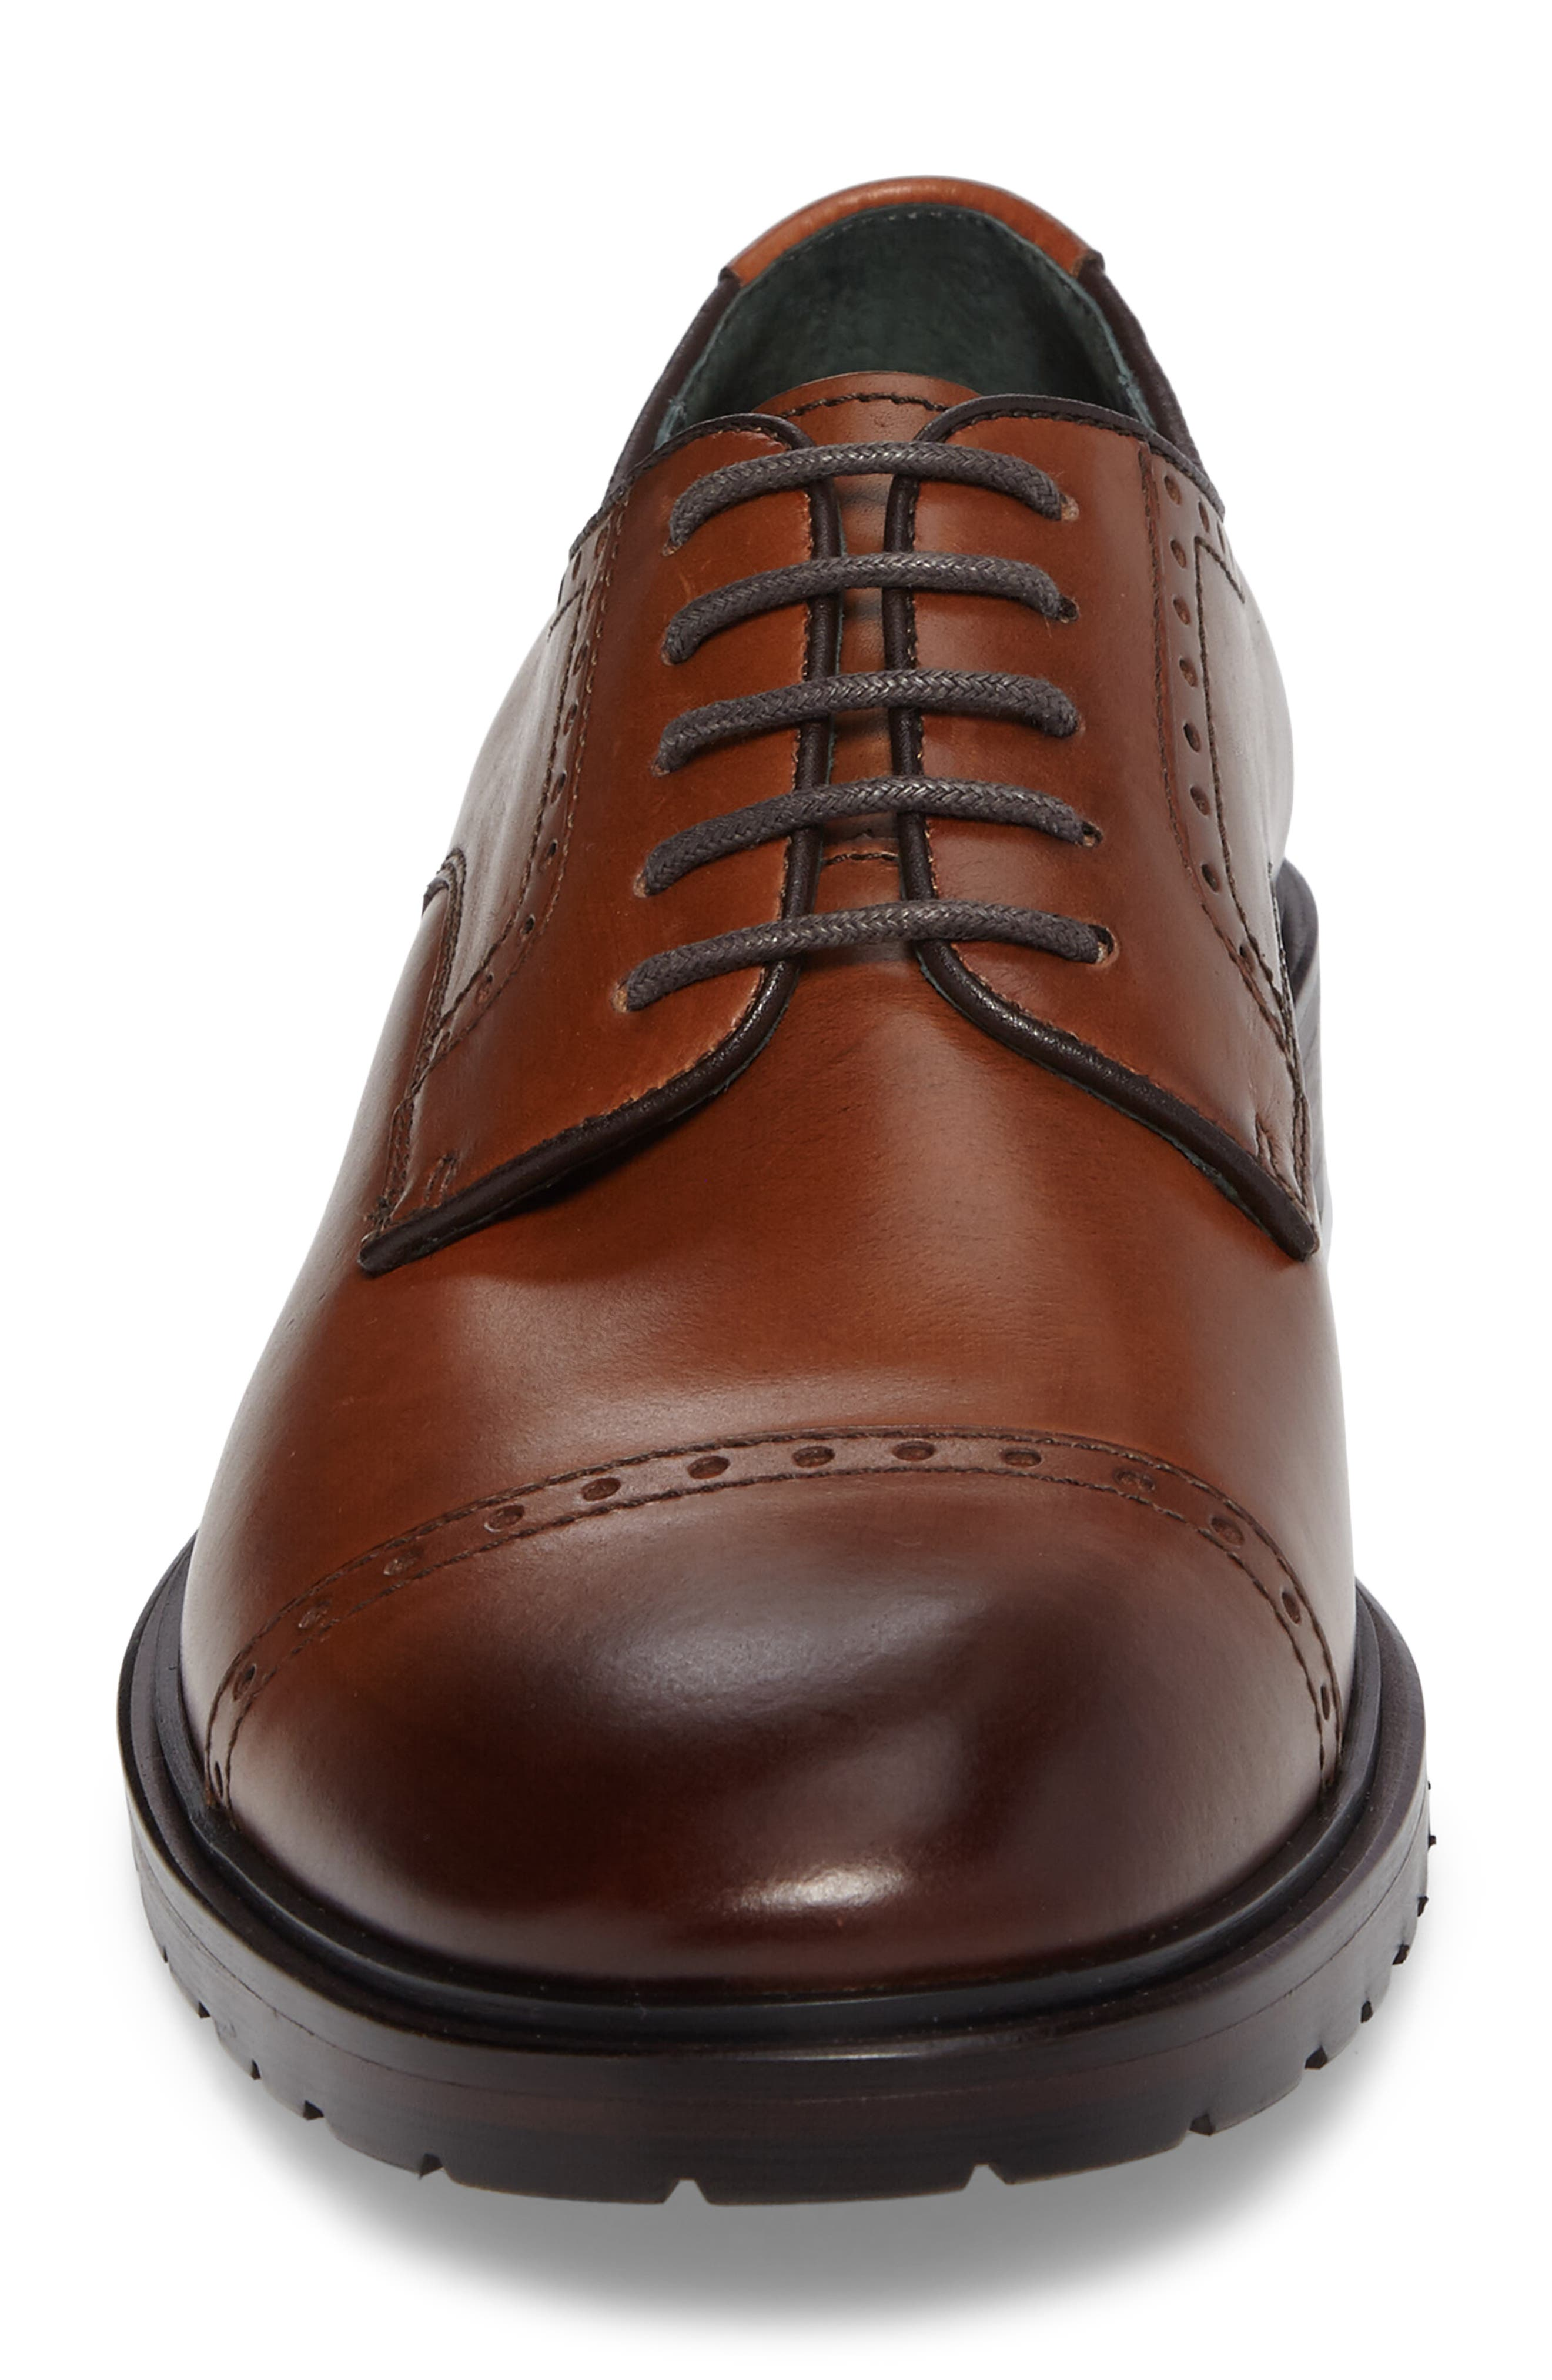 Myles Cap Toe Derby,                             Alternate thumbnail 4, color,                             Dark Cognac Leather